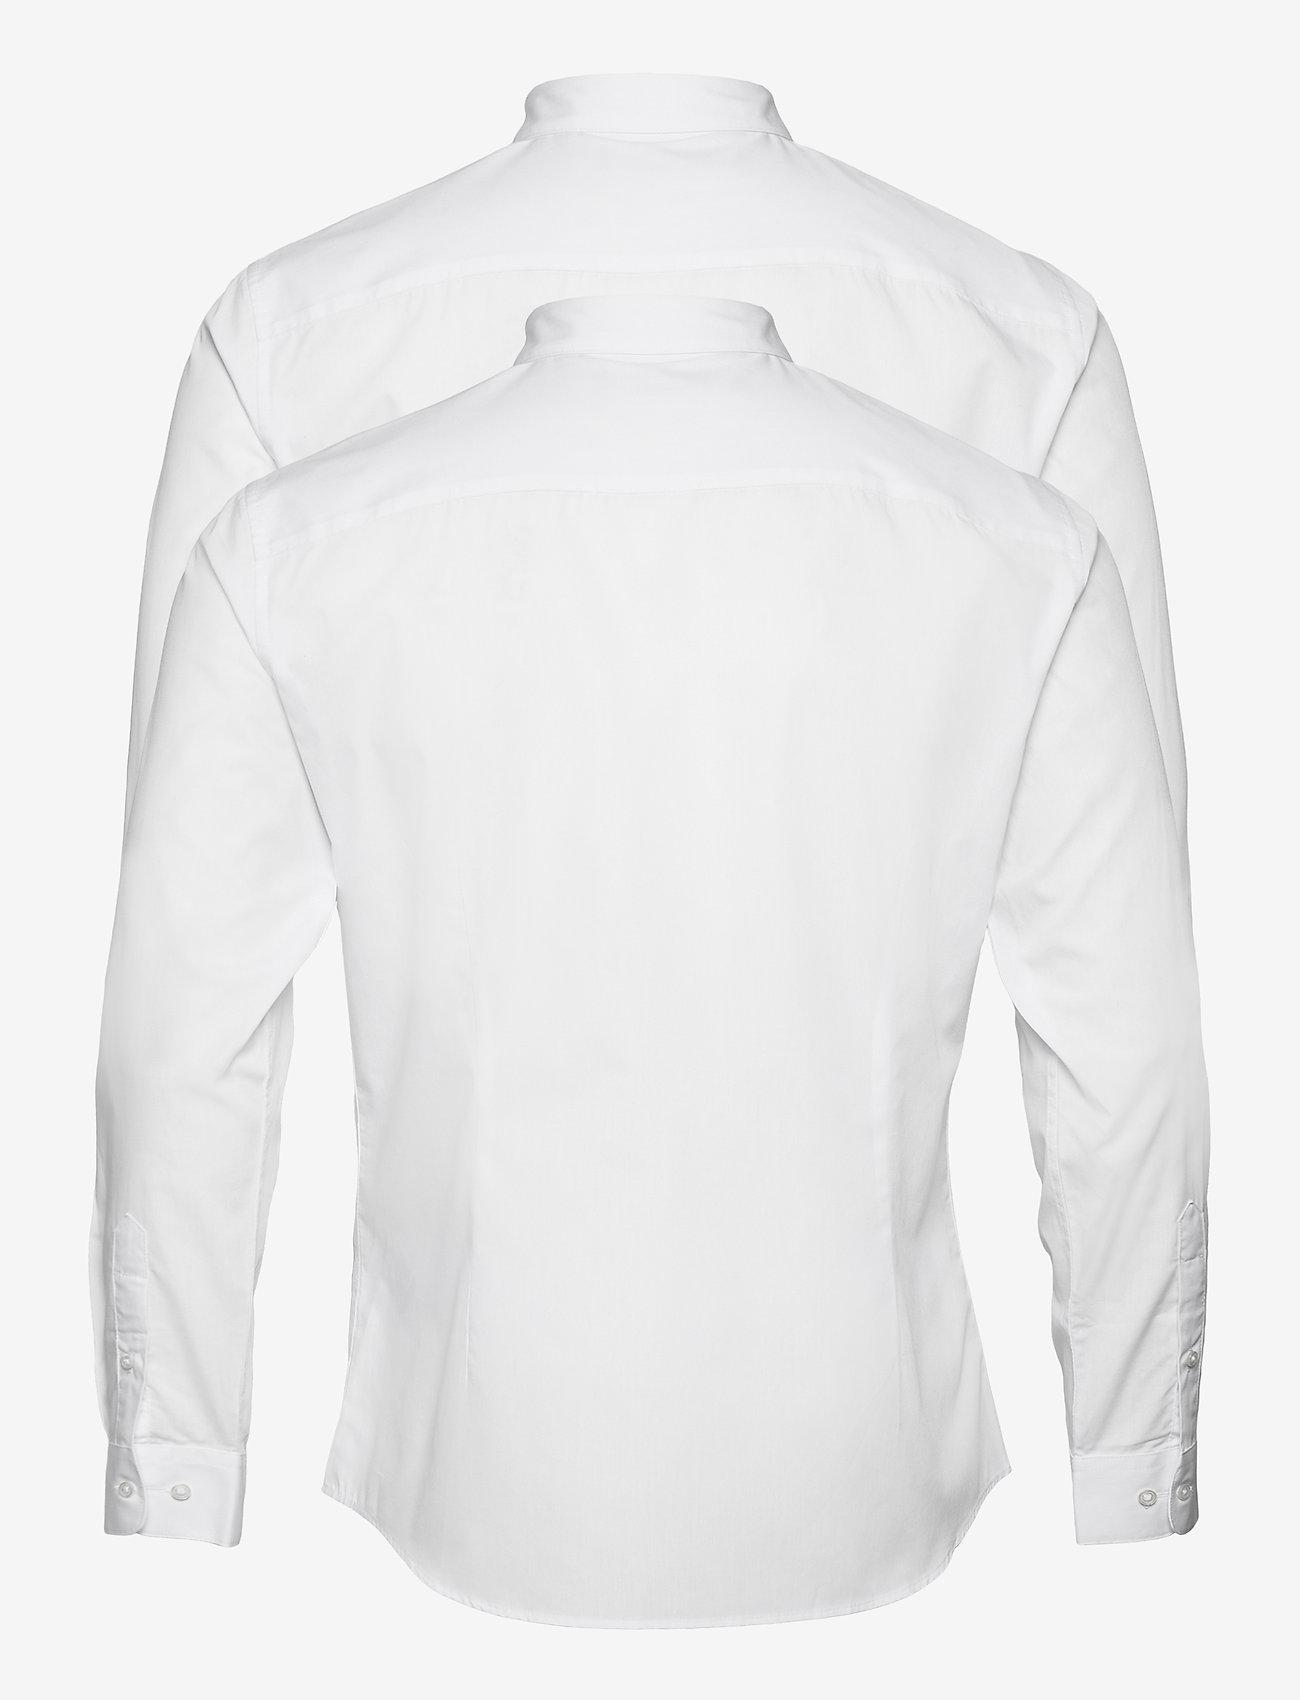 Jack & Jones - JJJOE SHIRT LS 2 PACK - basic skjortor - white - 1